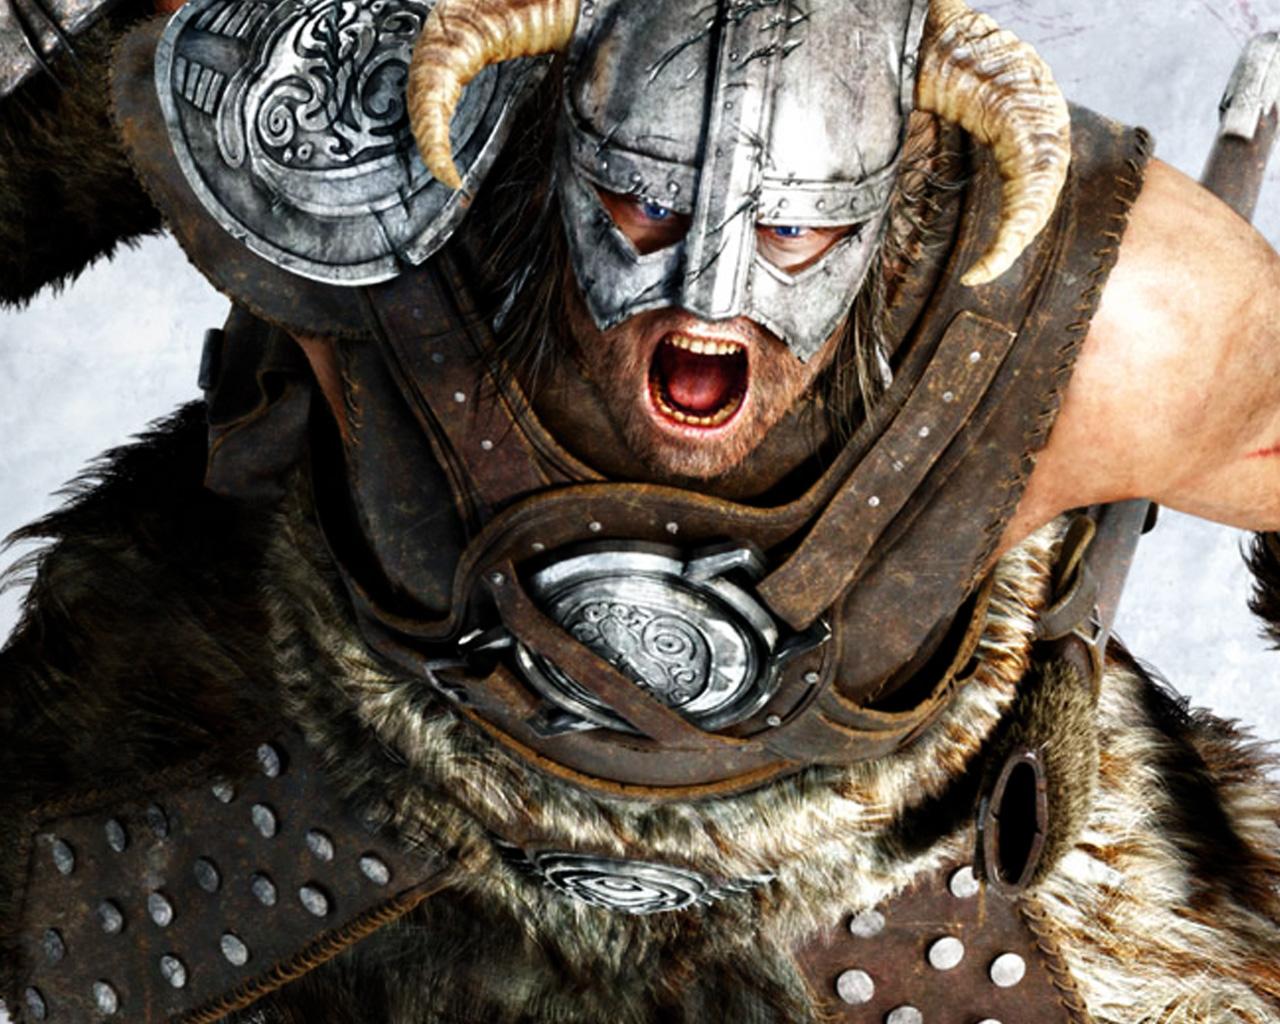 Free The Elder Scrolls V: Skyrim Wallpaper in 1280x1024